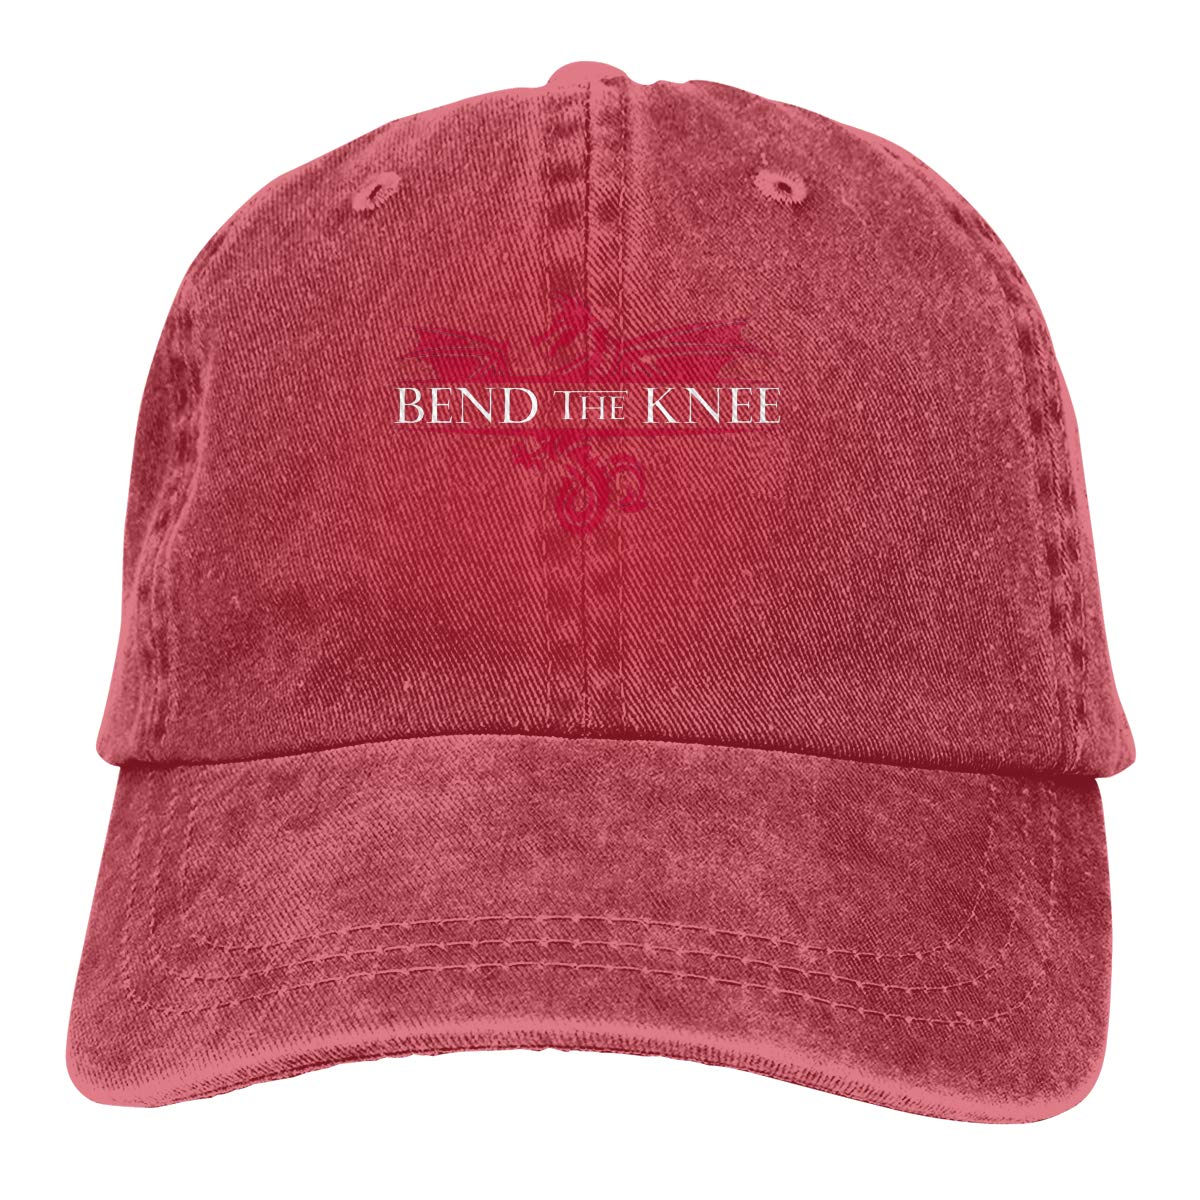 Bend The Knee Dragon Adjustable Denim Hats